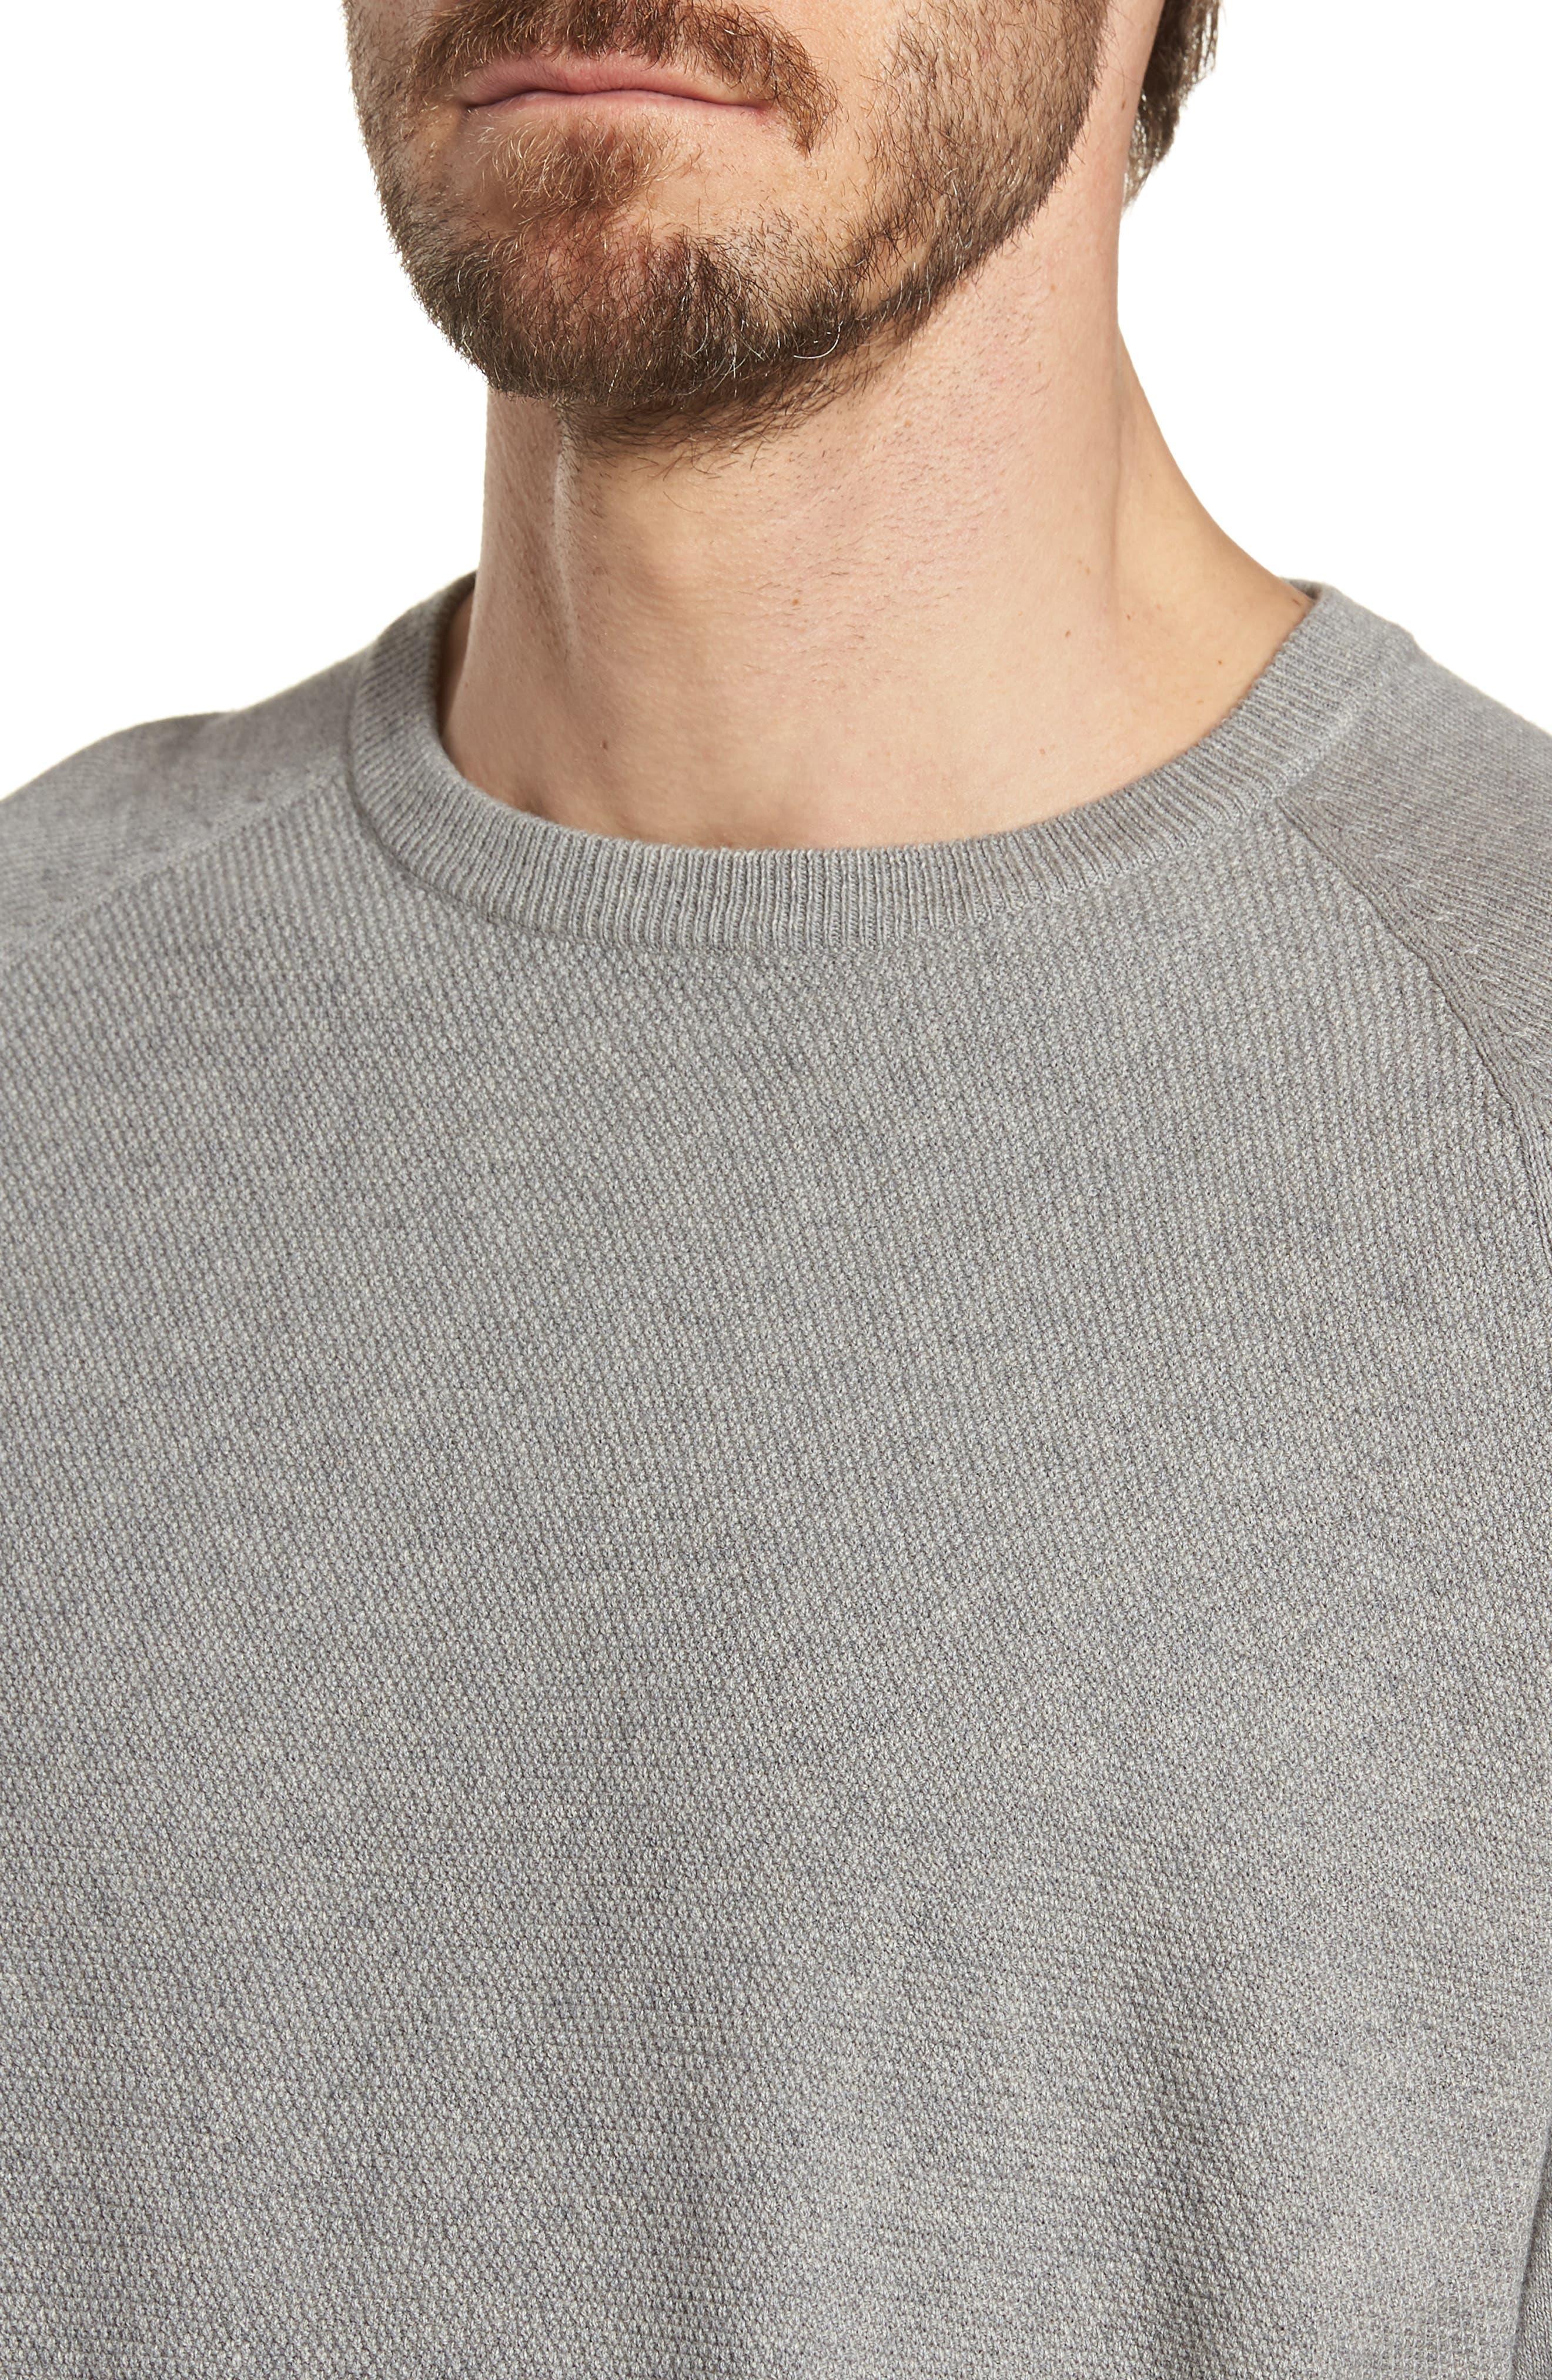 Crewneck Cotton & Cashmere Sweater,                             Alternate thumbnail 4, color,                             Grey Medium Heather